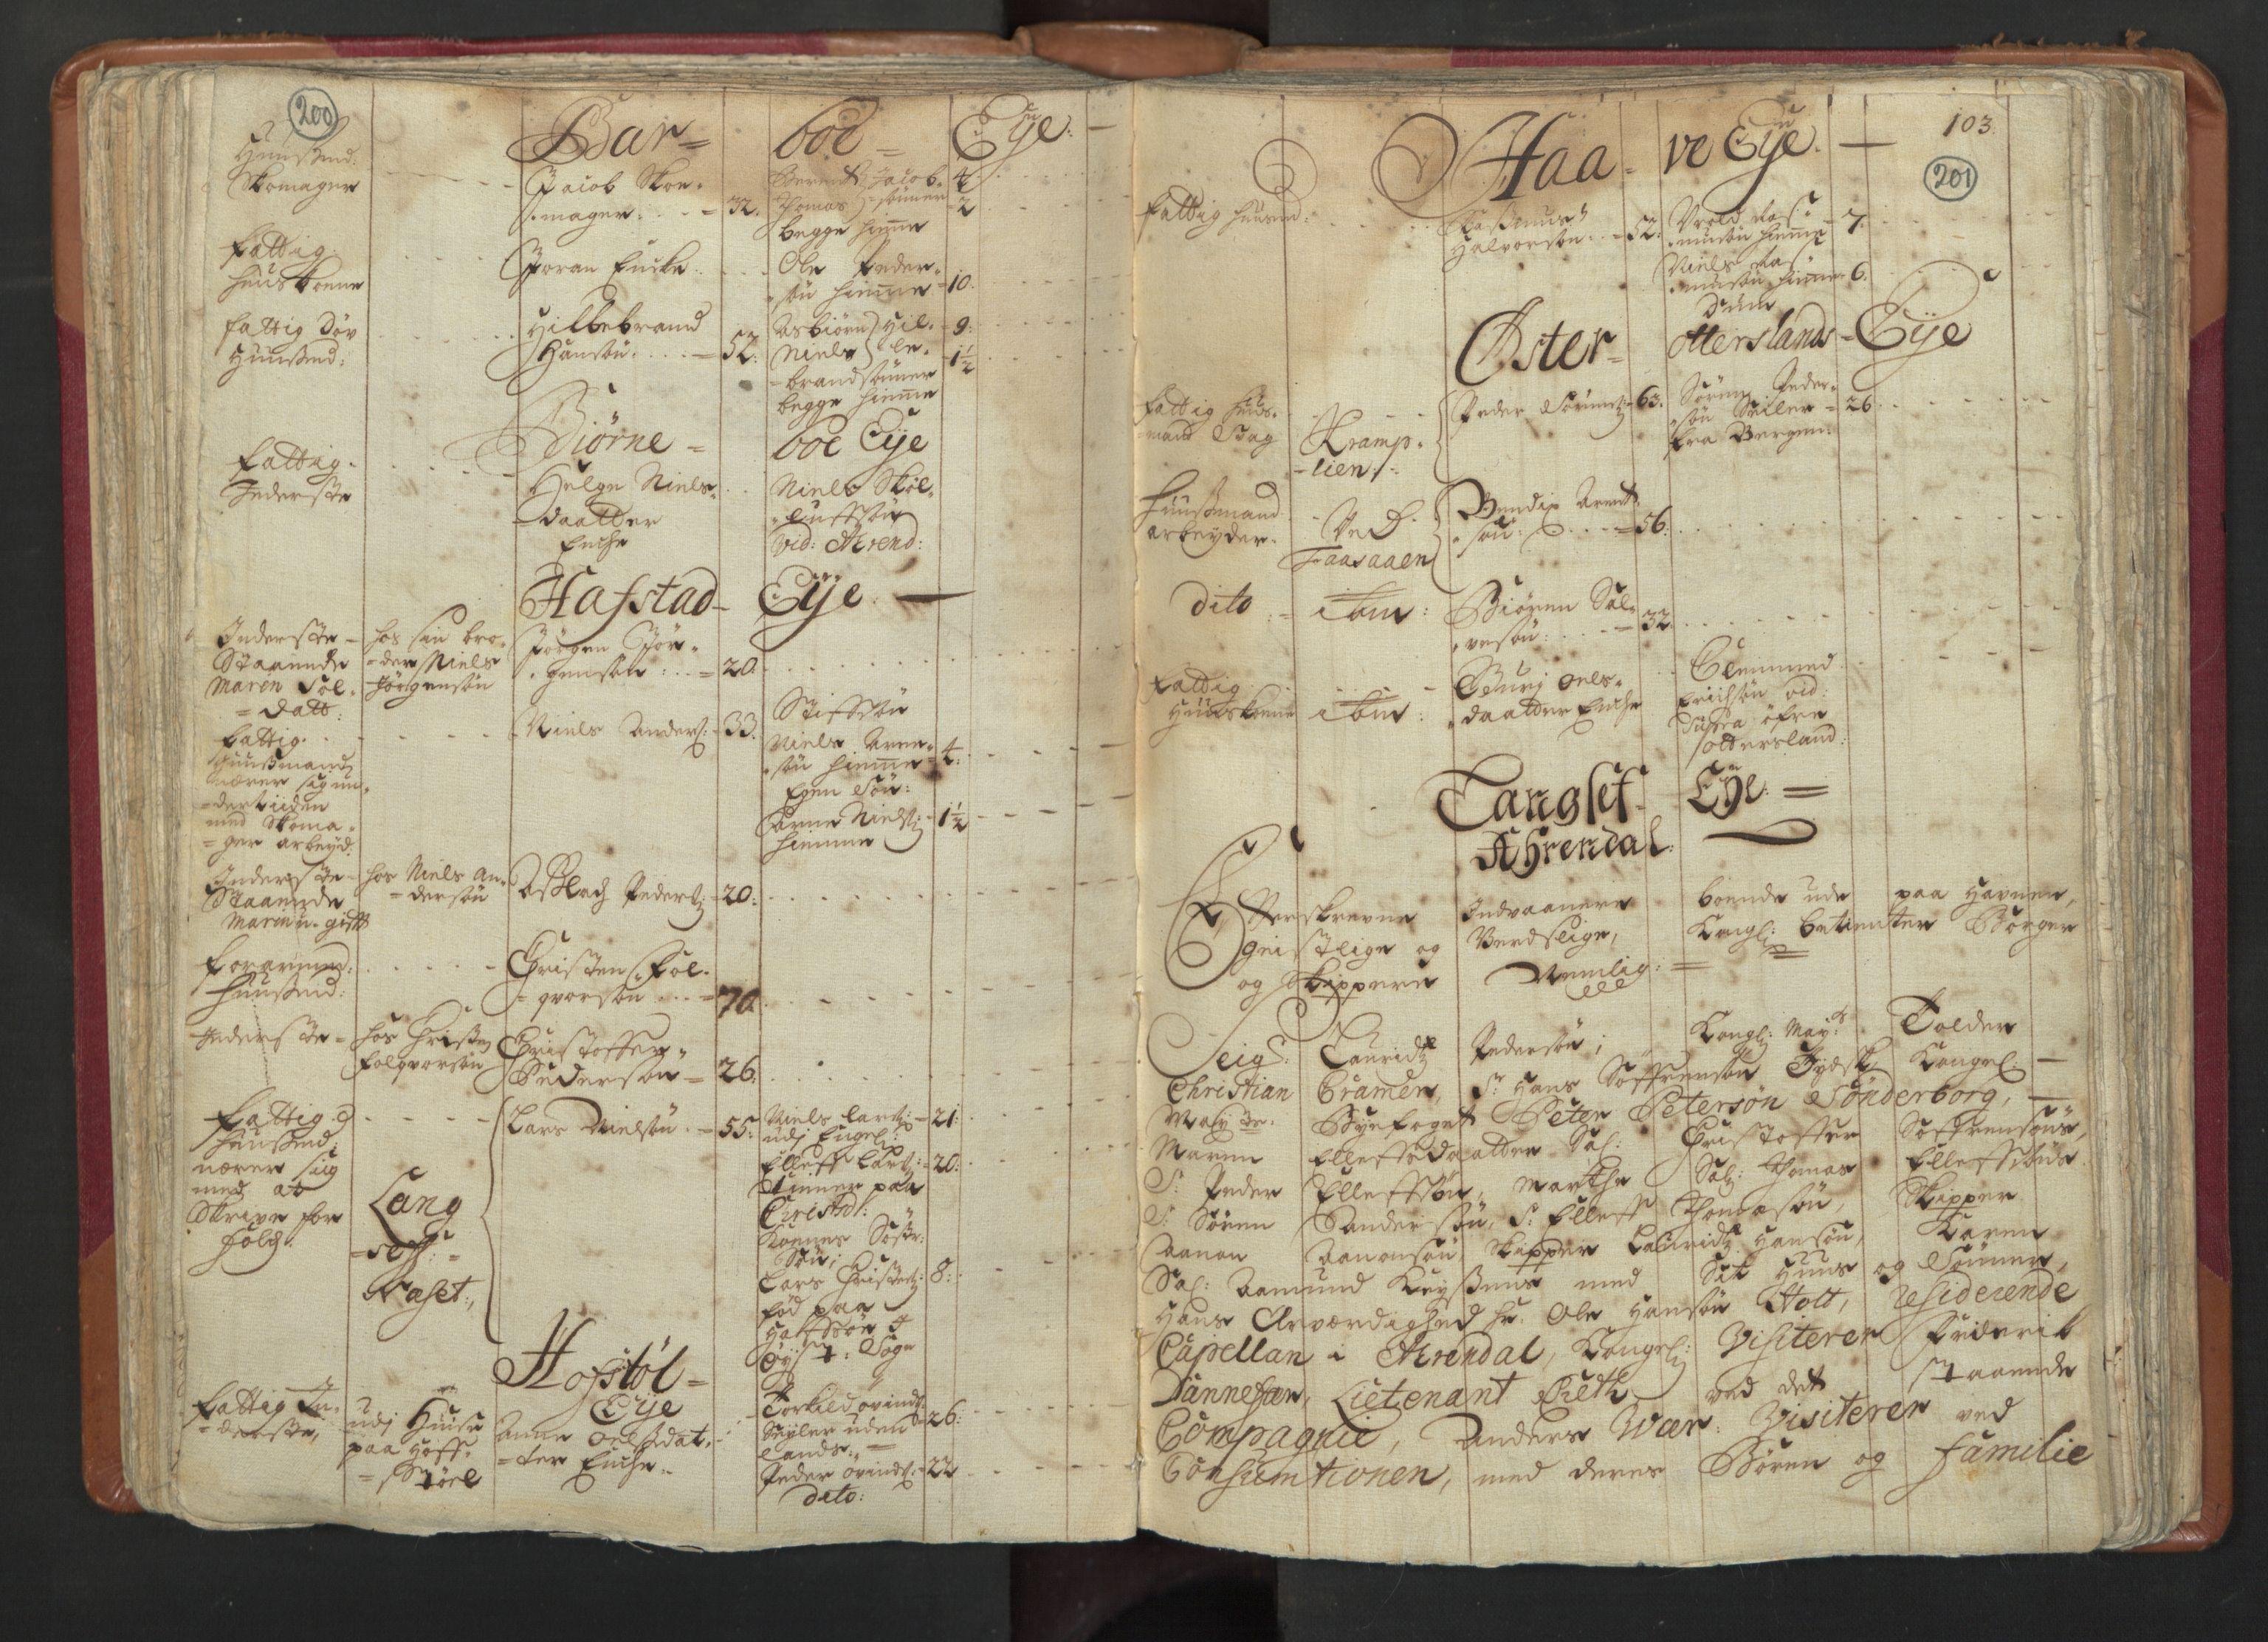 RA, Manntallet 1701, nr. 3: Nedenes fogderi, 1701, s. 200-201